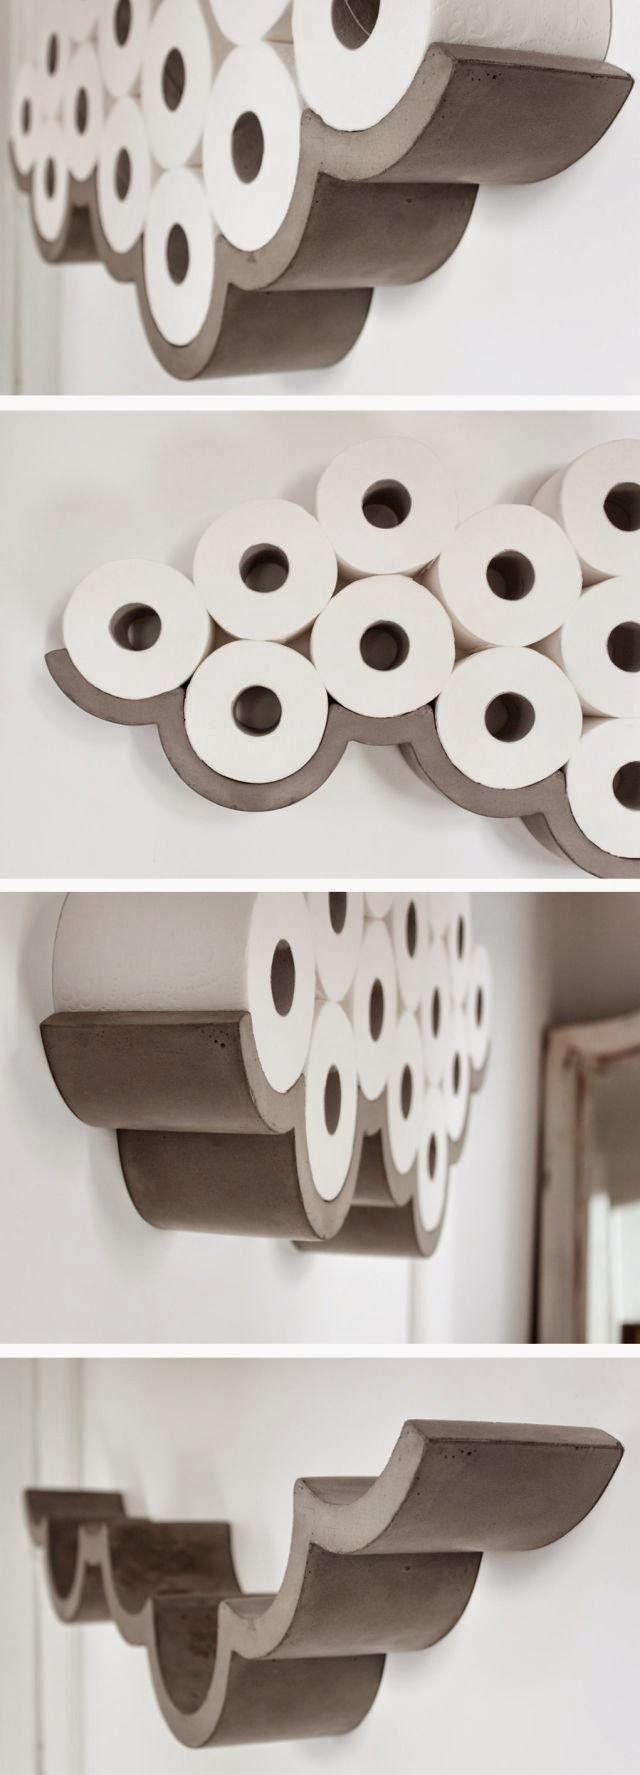 Bathroom Toilet Roll Holder Ideas